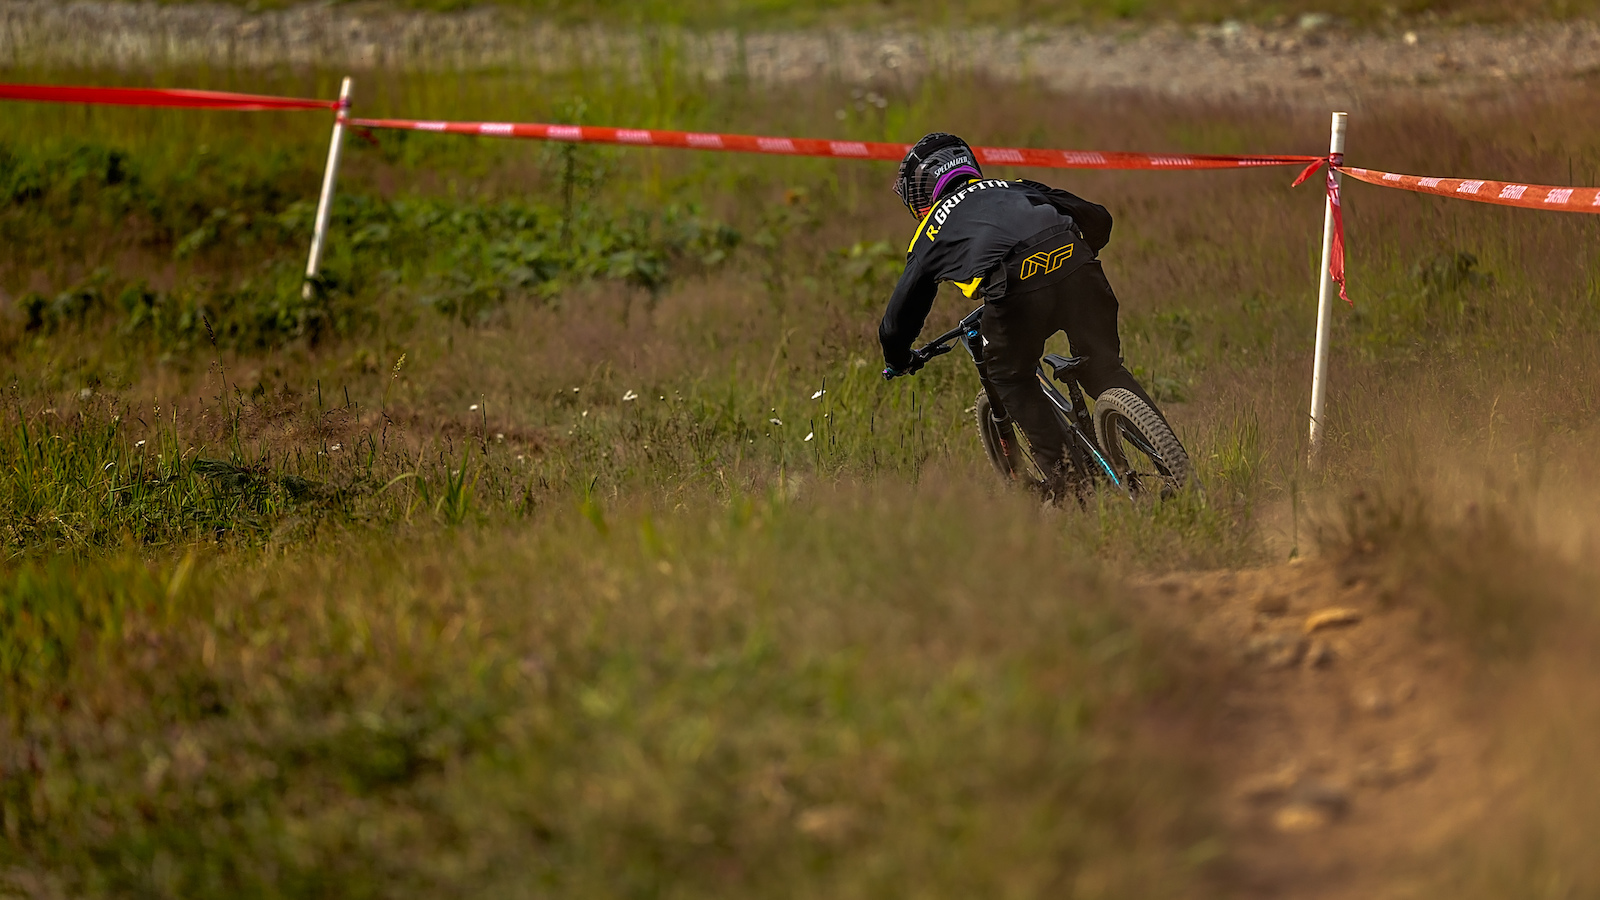 (Photo by clint trahan/clinttrahan.com)